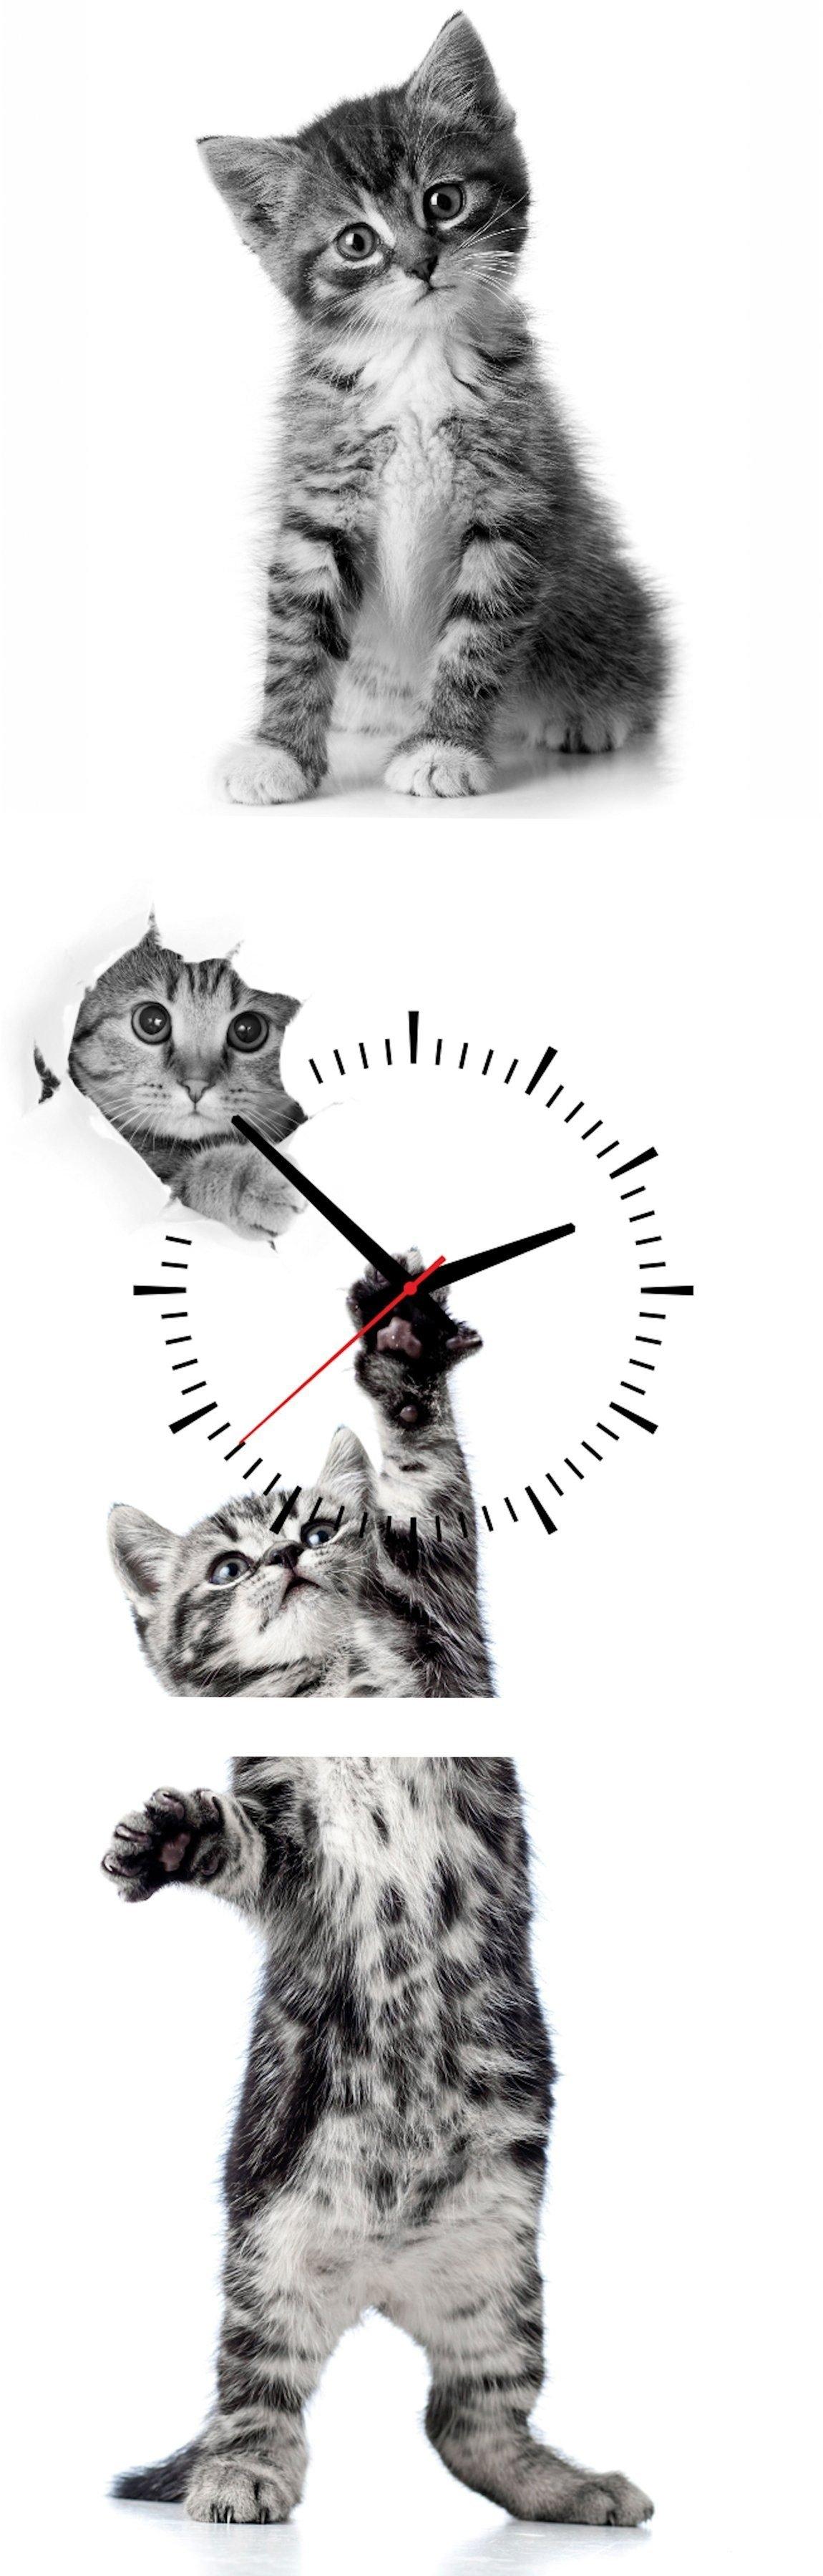 Conni Oberkircher´s Wanddecoratie Kitty met decoratieve klok (set) nu online bestellen